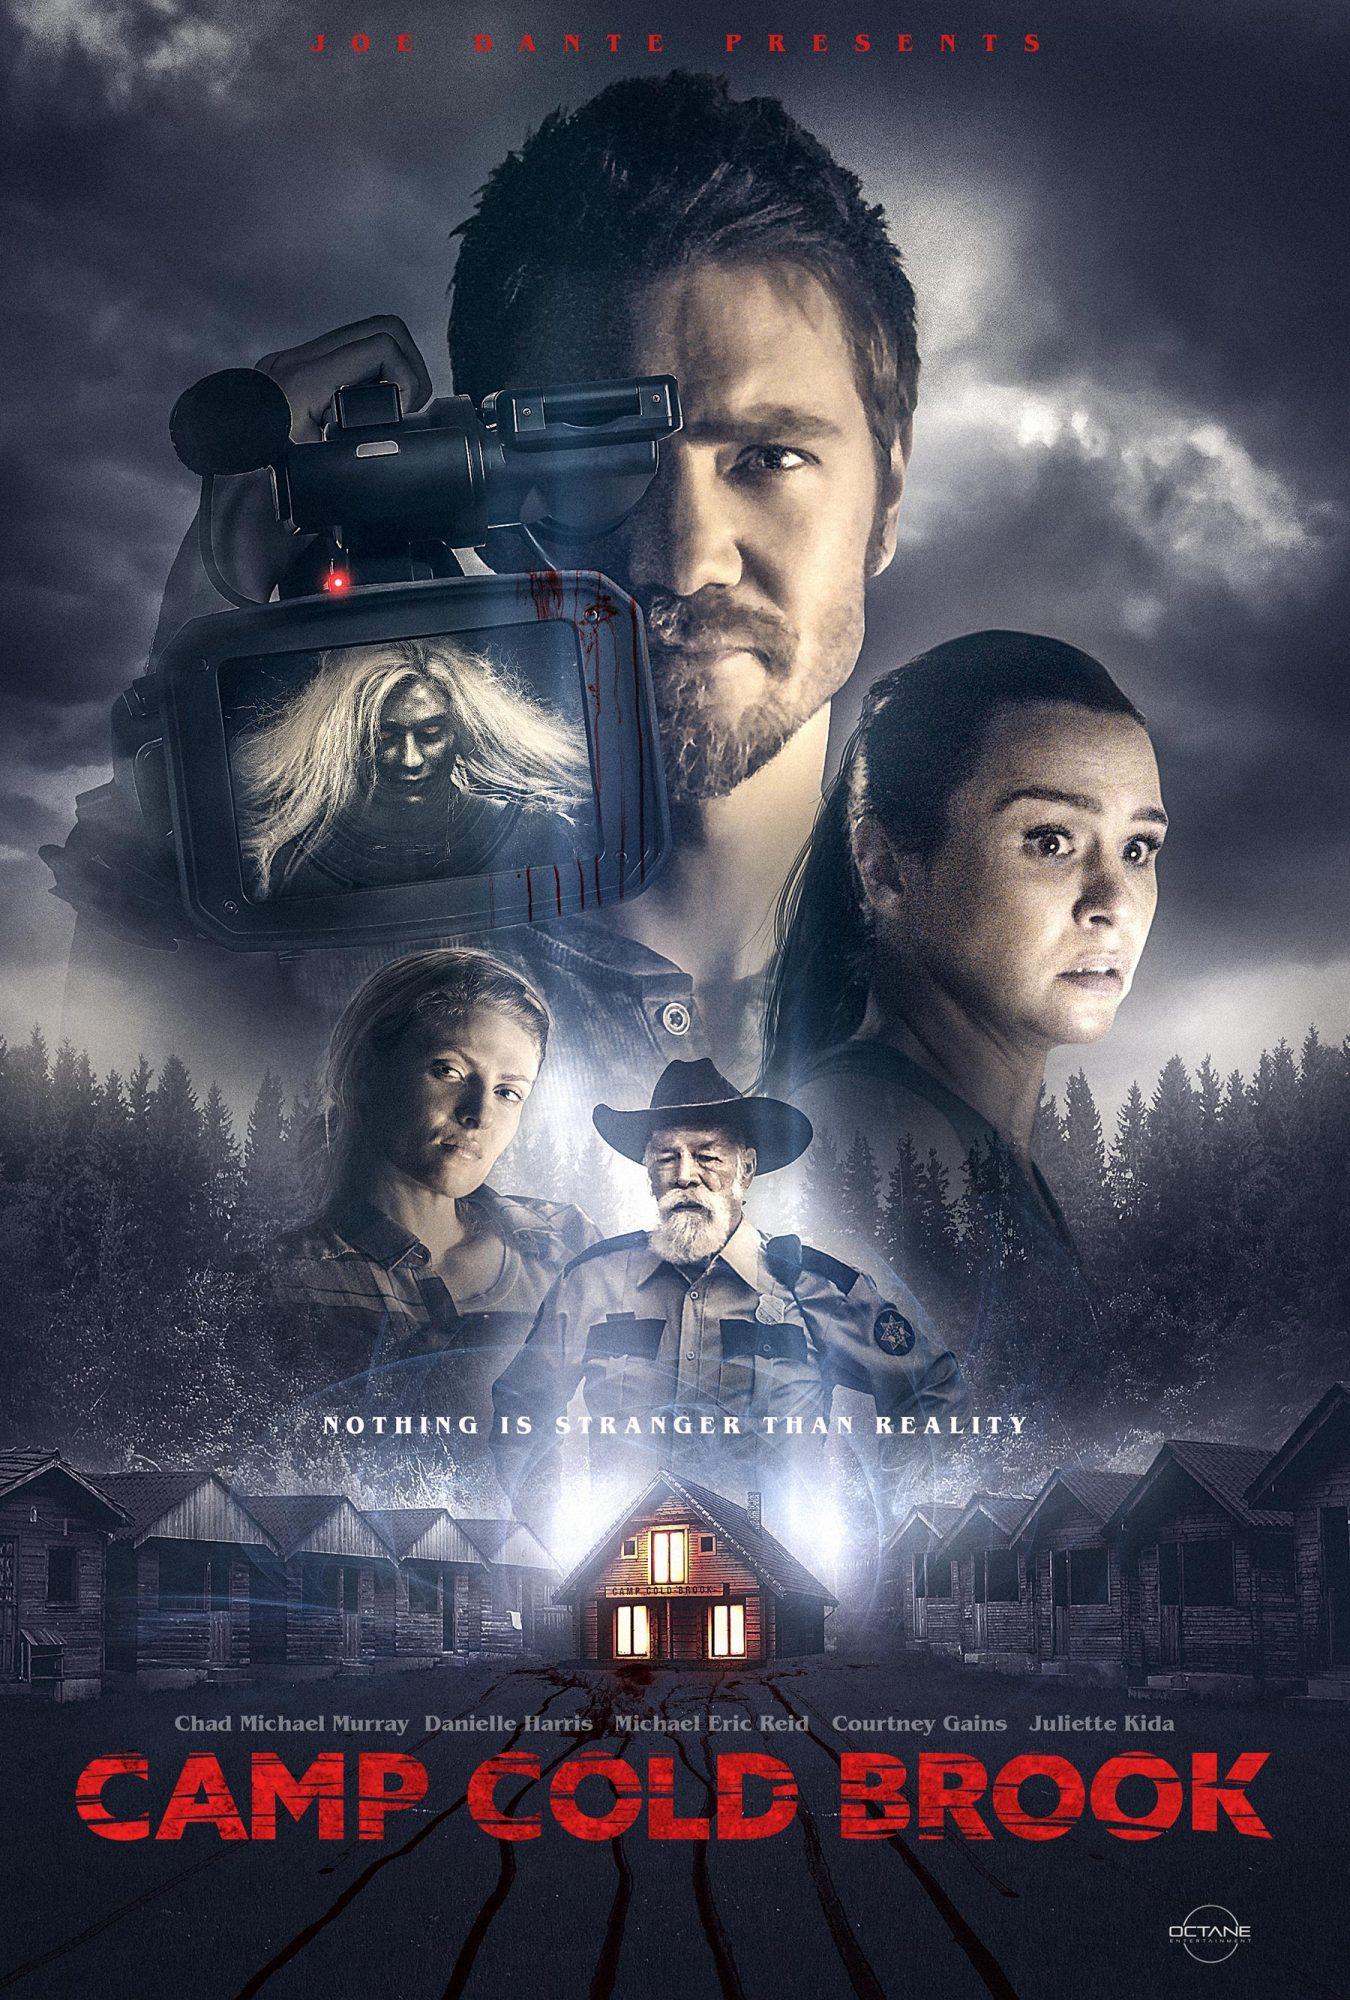 Camp Cold Brook movie posterCR: Octane